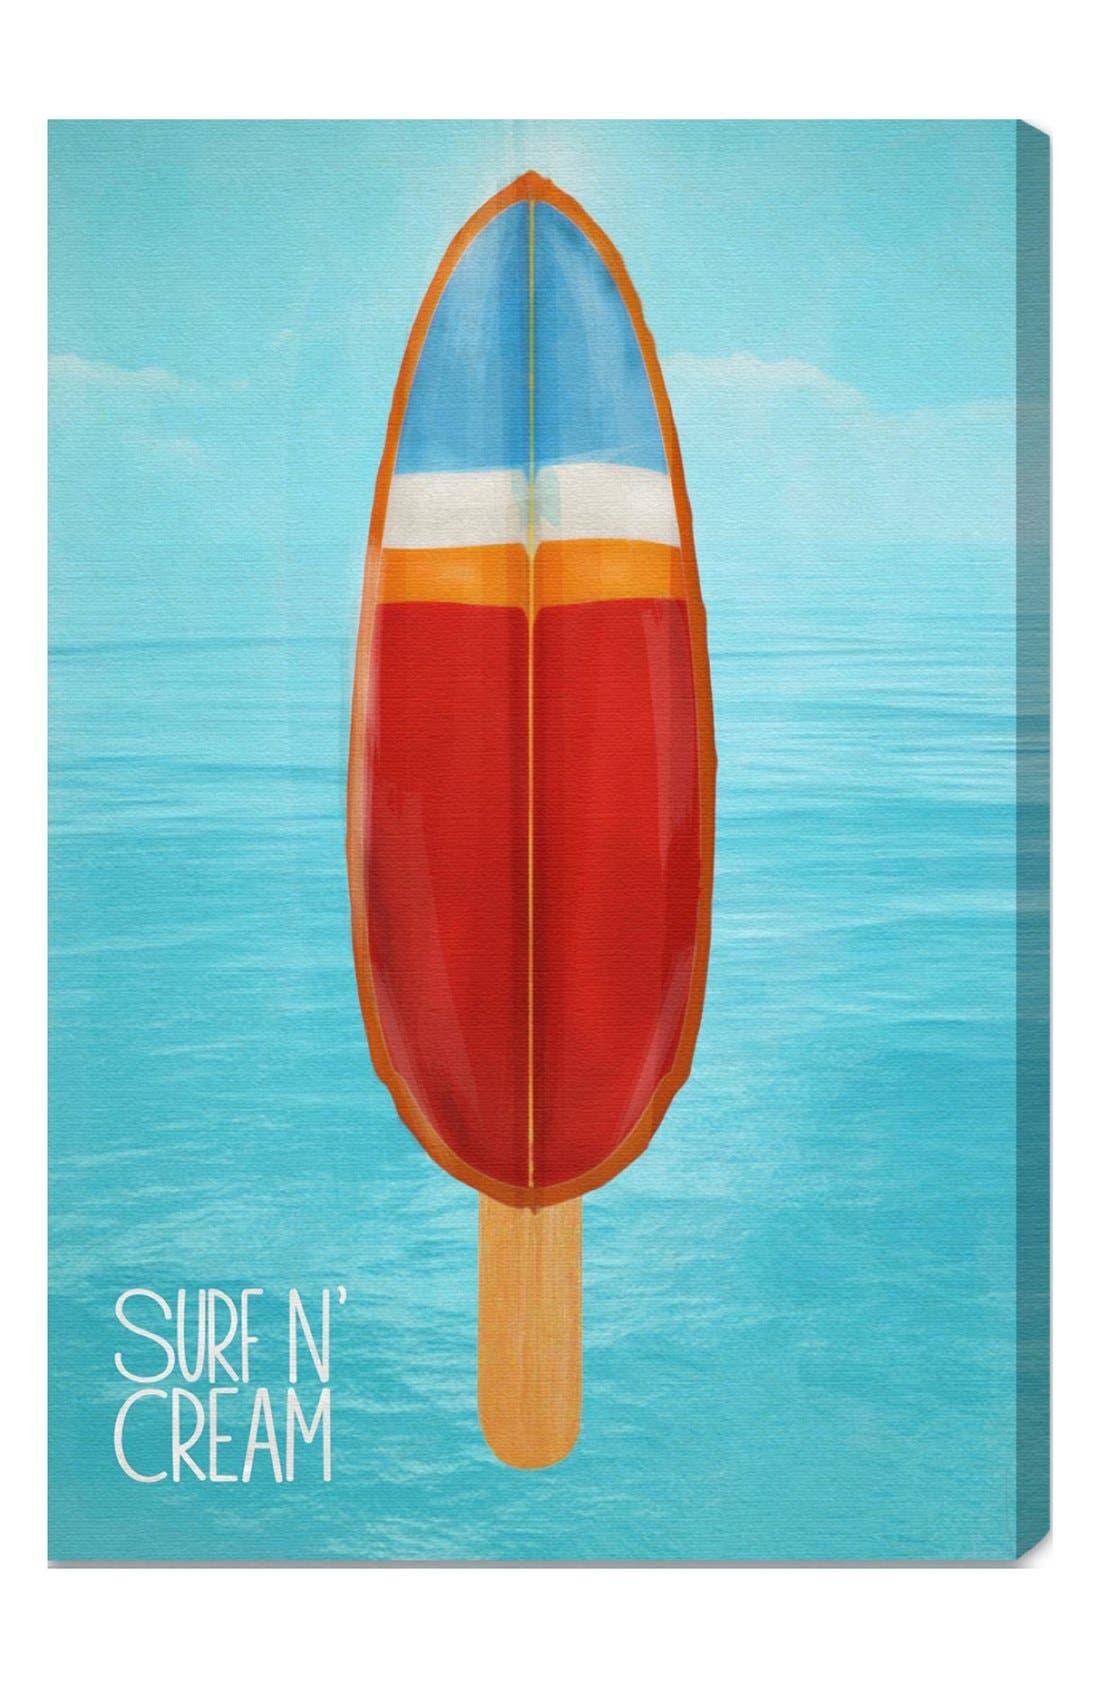 Alternate Image 1 Selected - Oliver Gal 'Surf 'n Cream' Wall Art